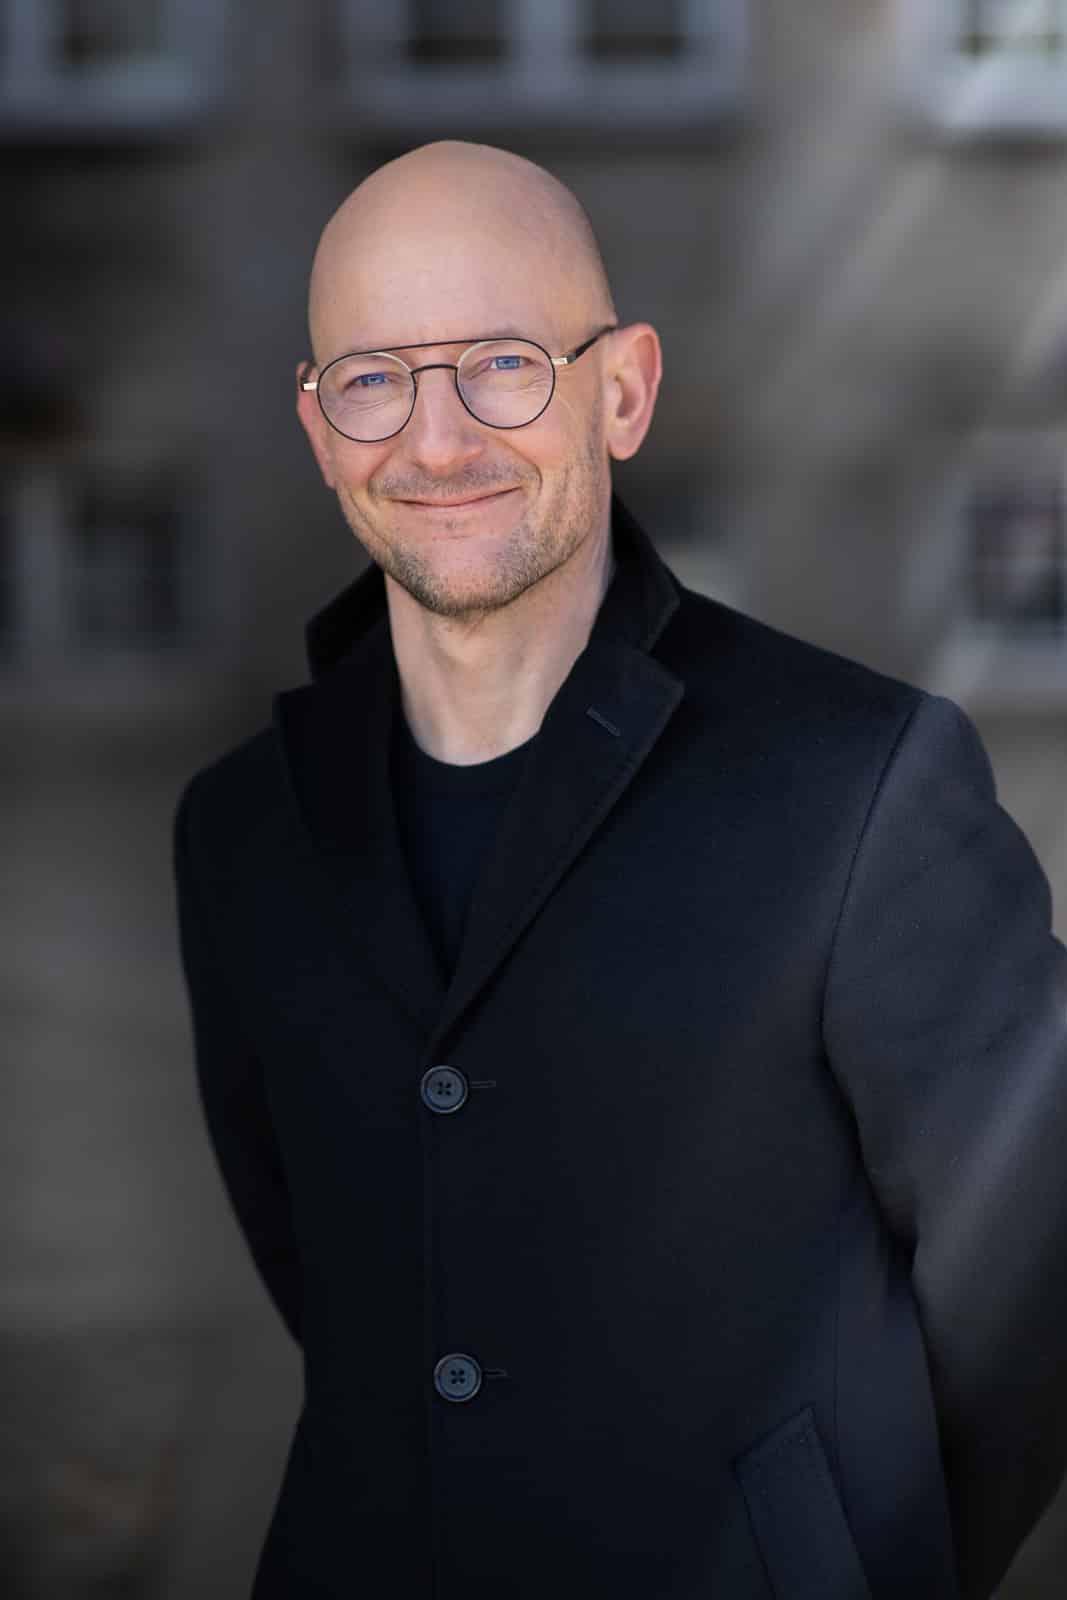 Jacob Søndergaard / Cph / 2021